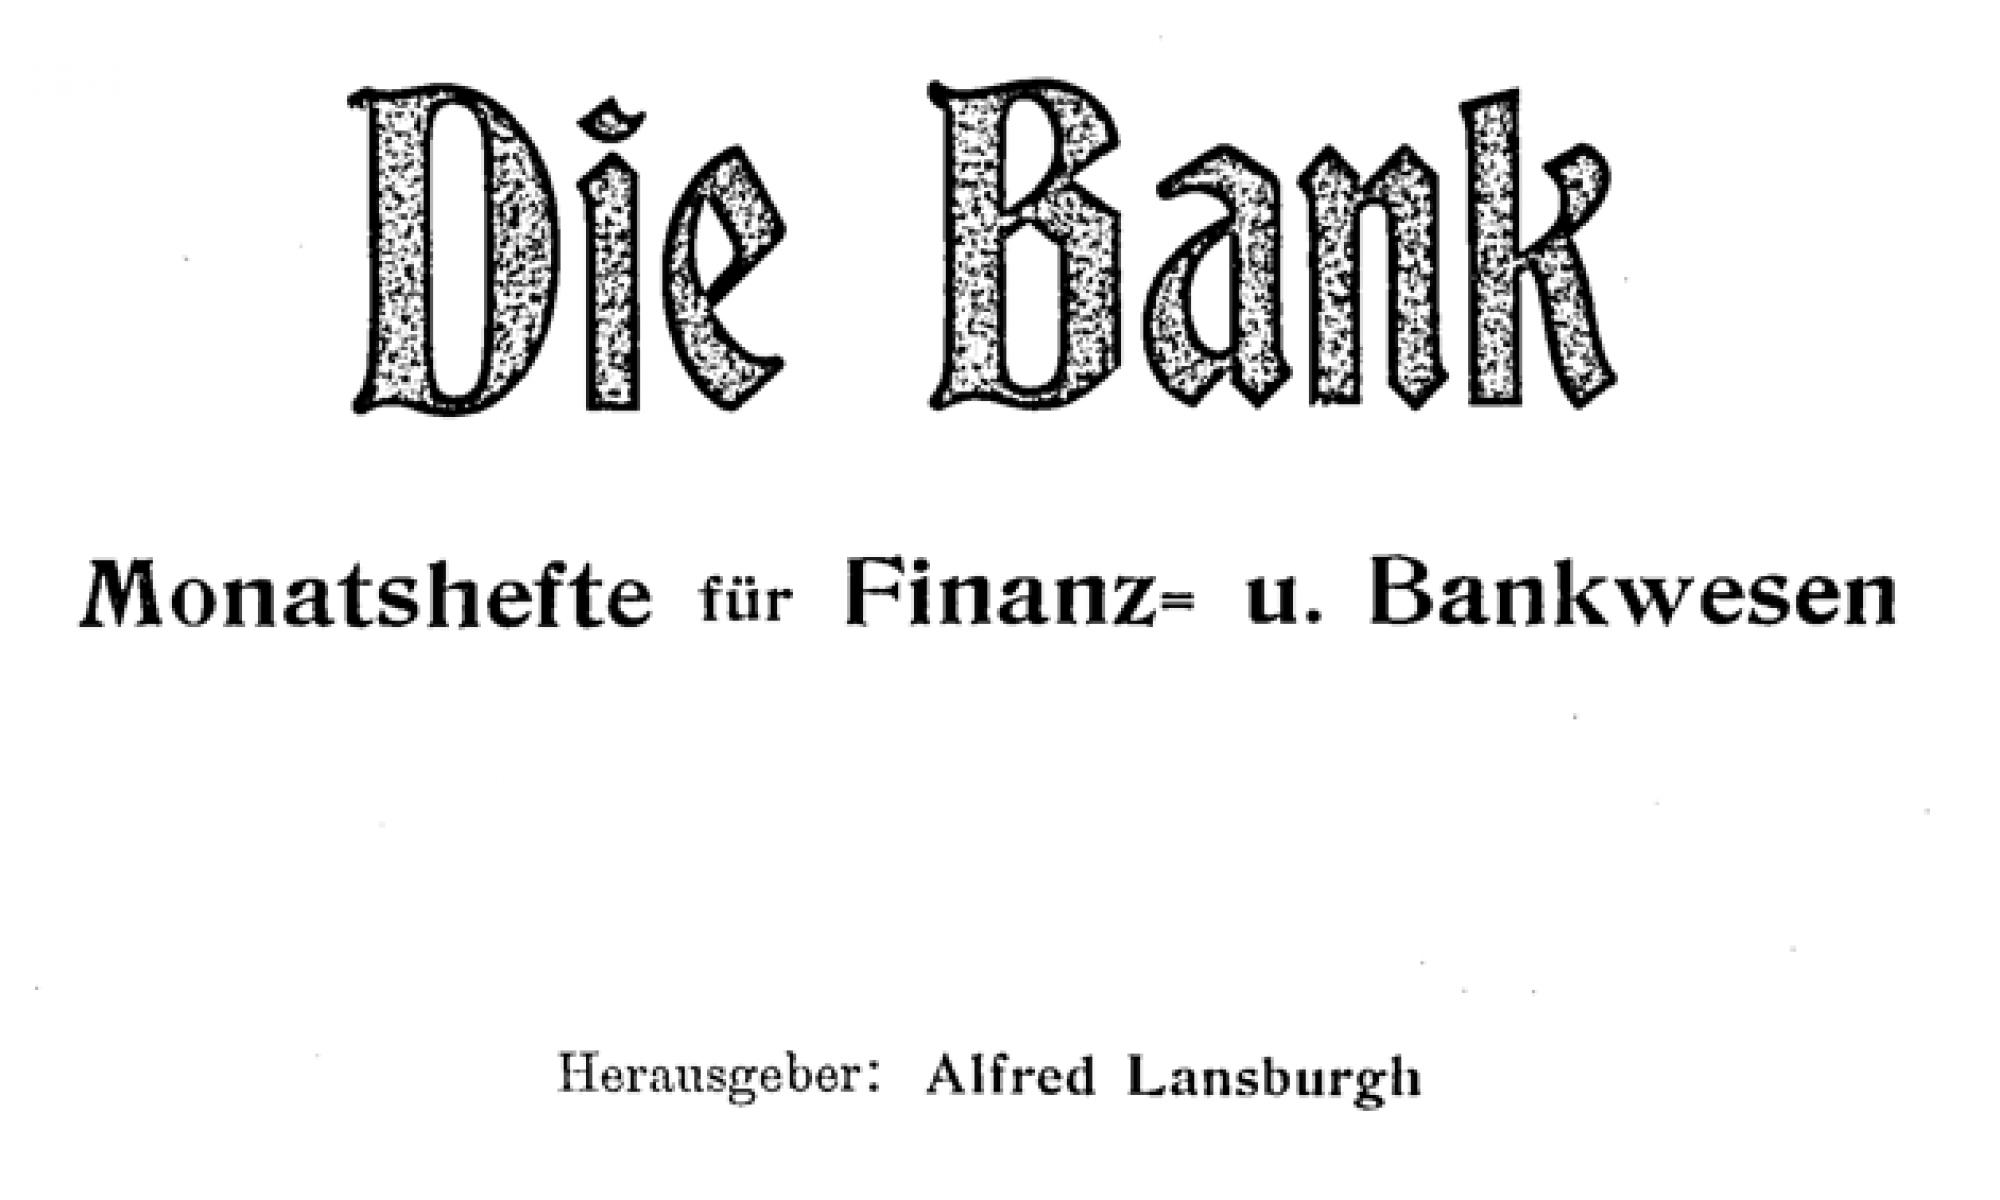 Alfred Lansburgh (1872-1937)